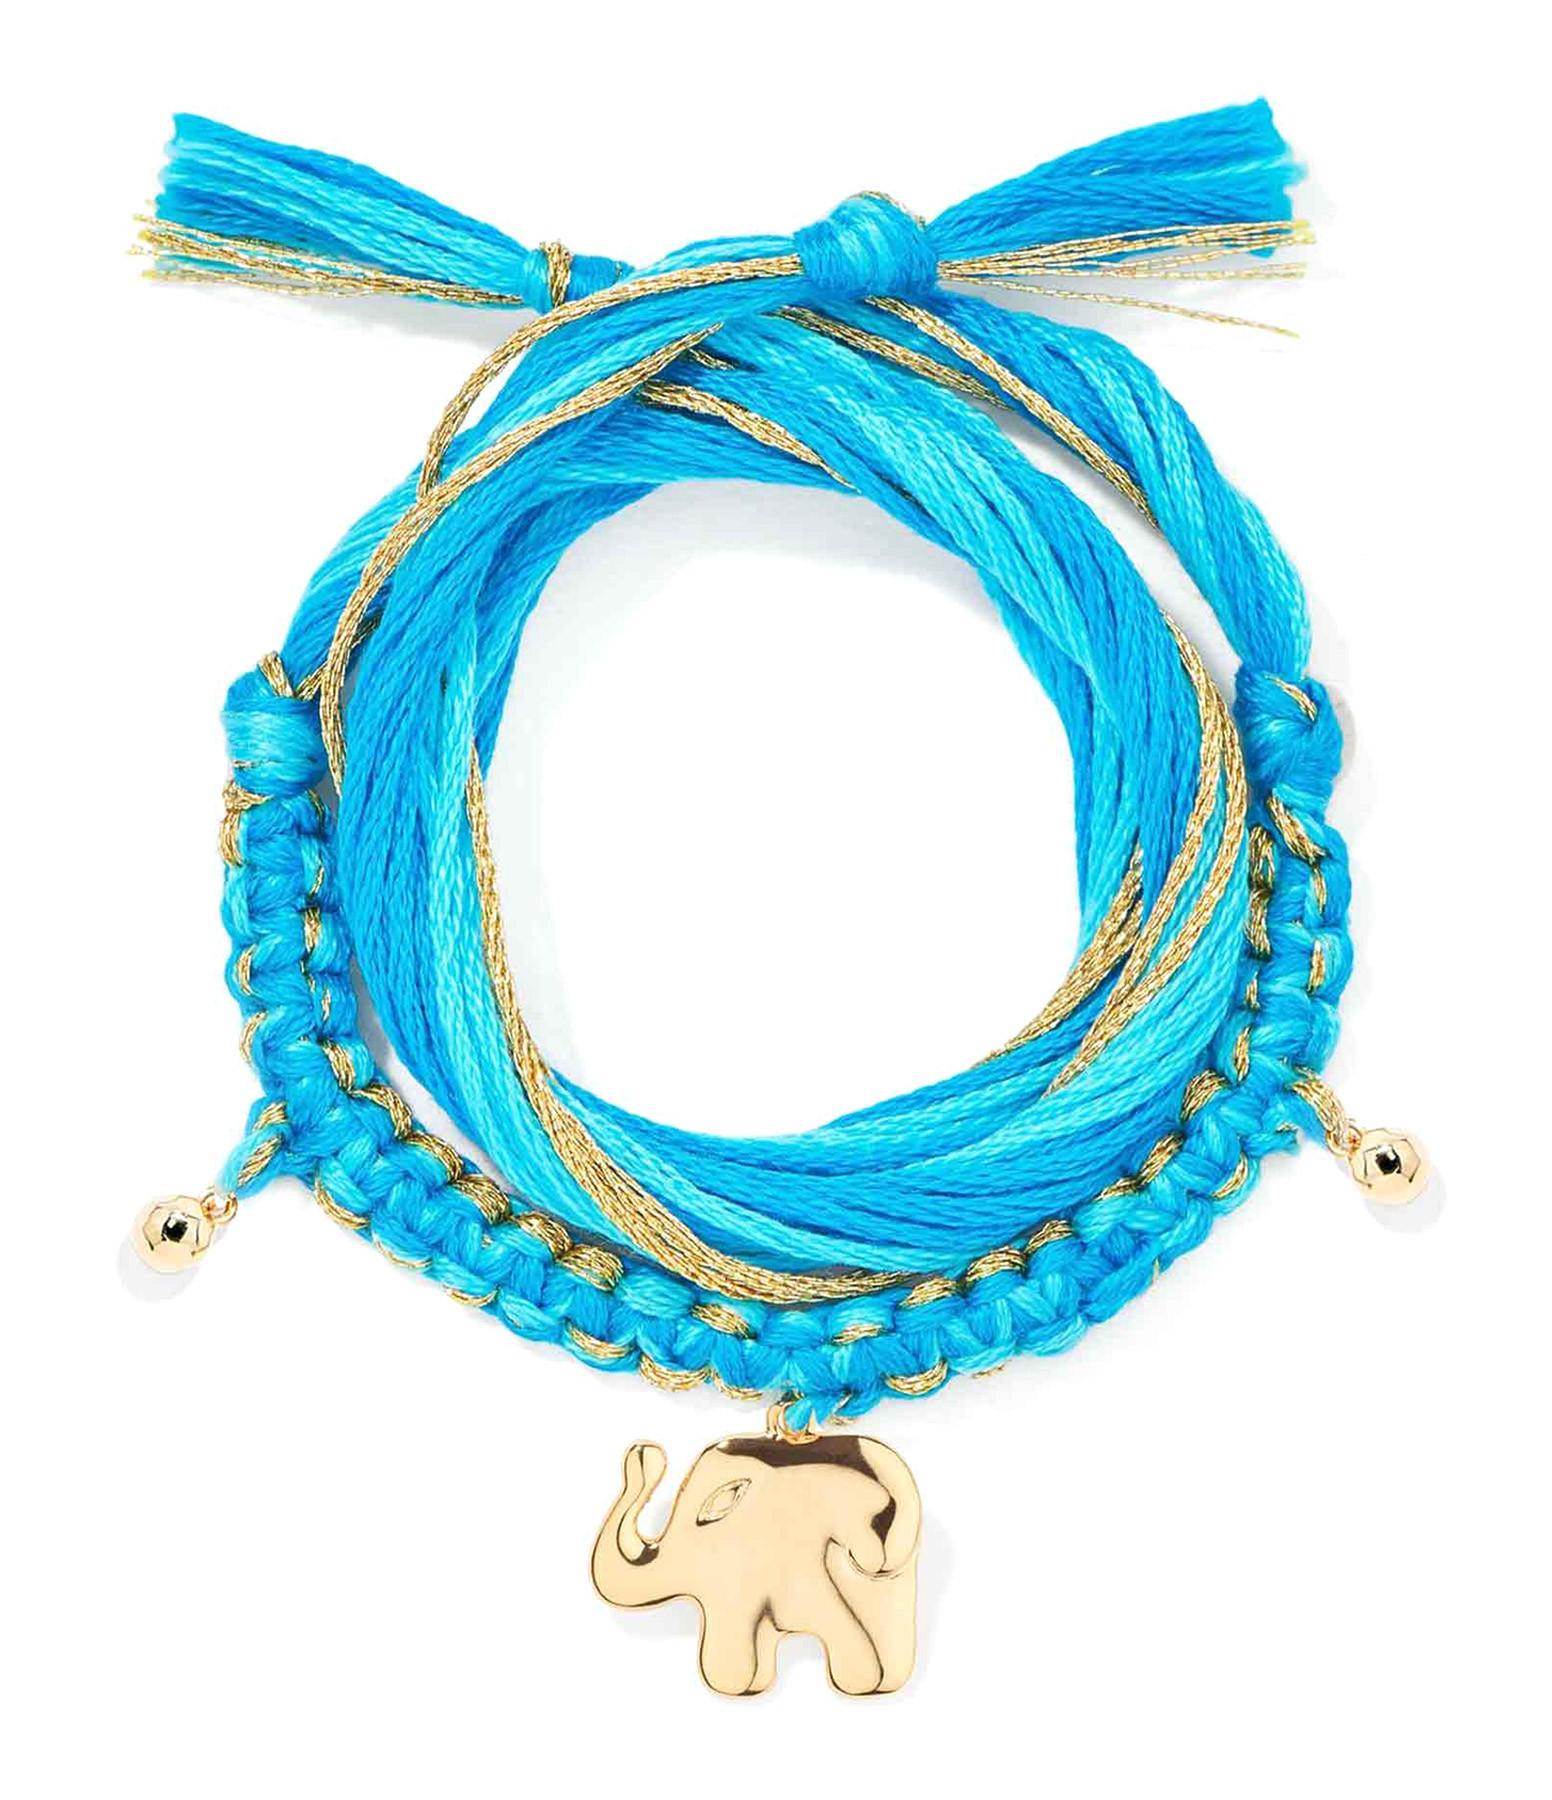 AURELIE BIDERMANN - Bracelet Honolulu Charm Éléphant Bleu Plaqué Or